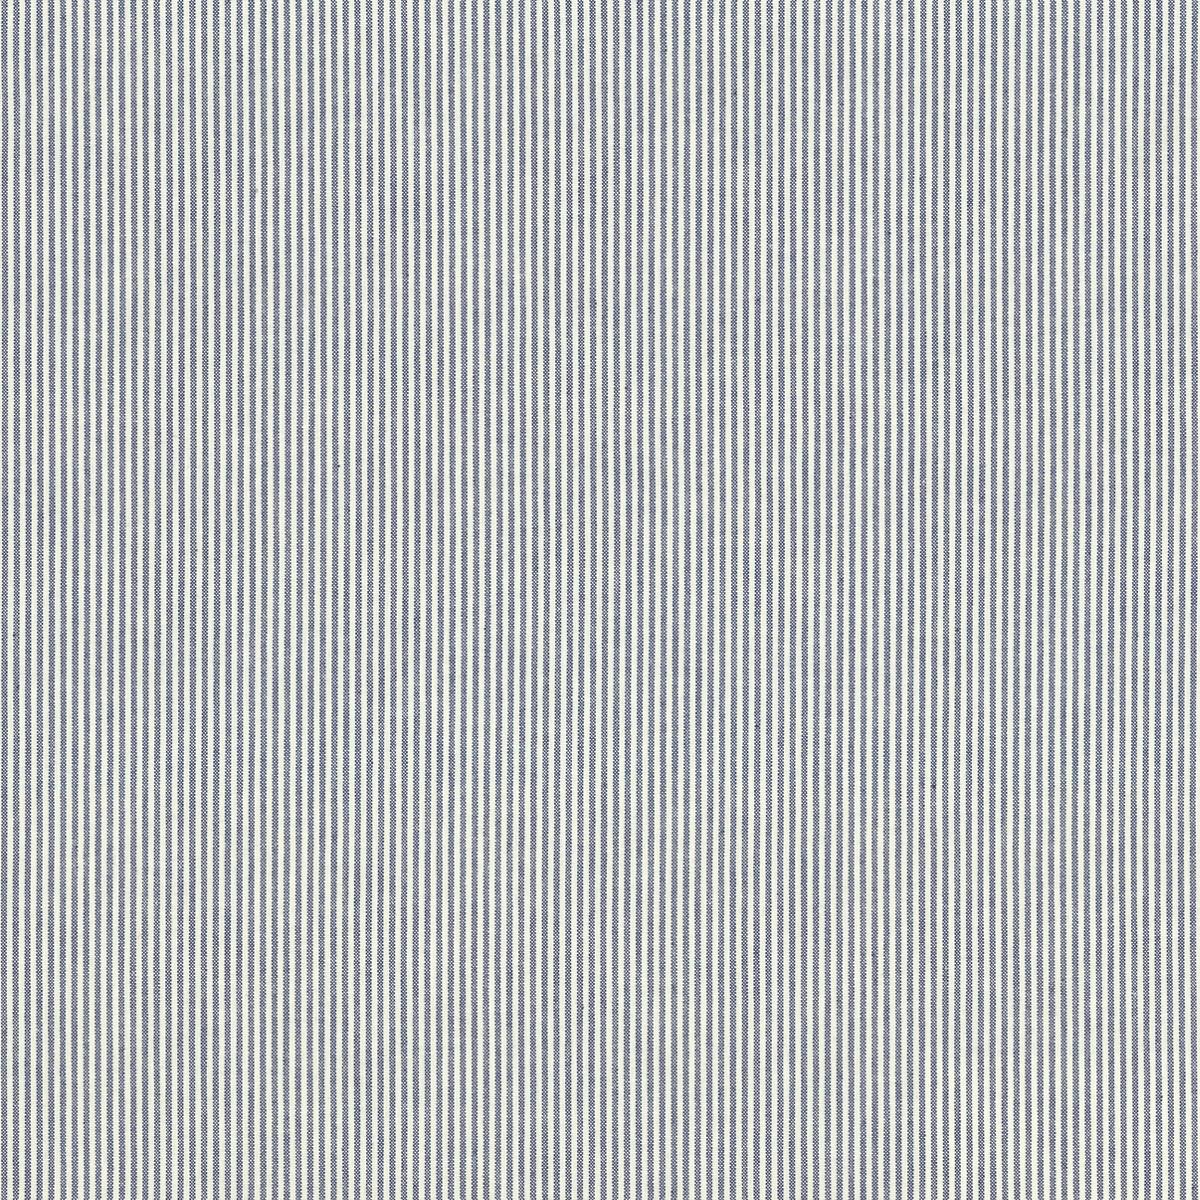 Pinstripe Navy Fabric